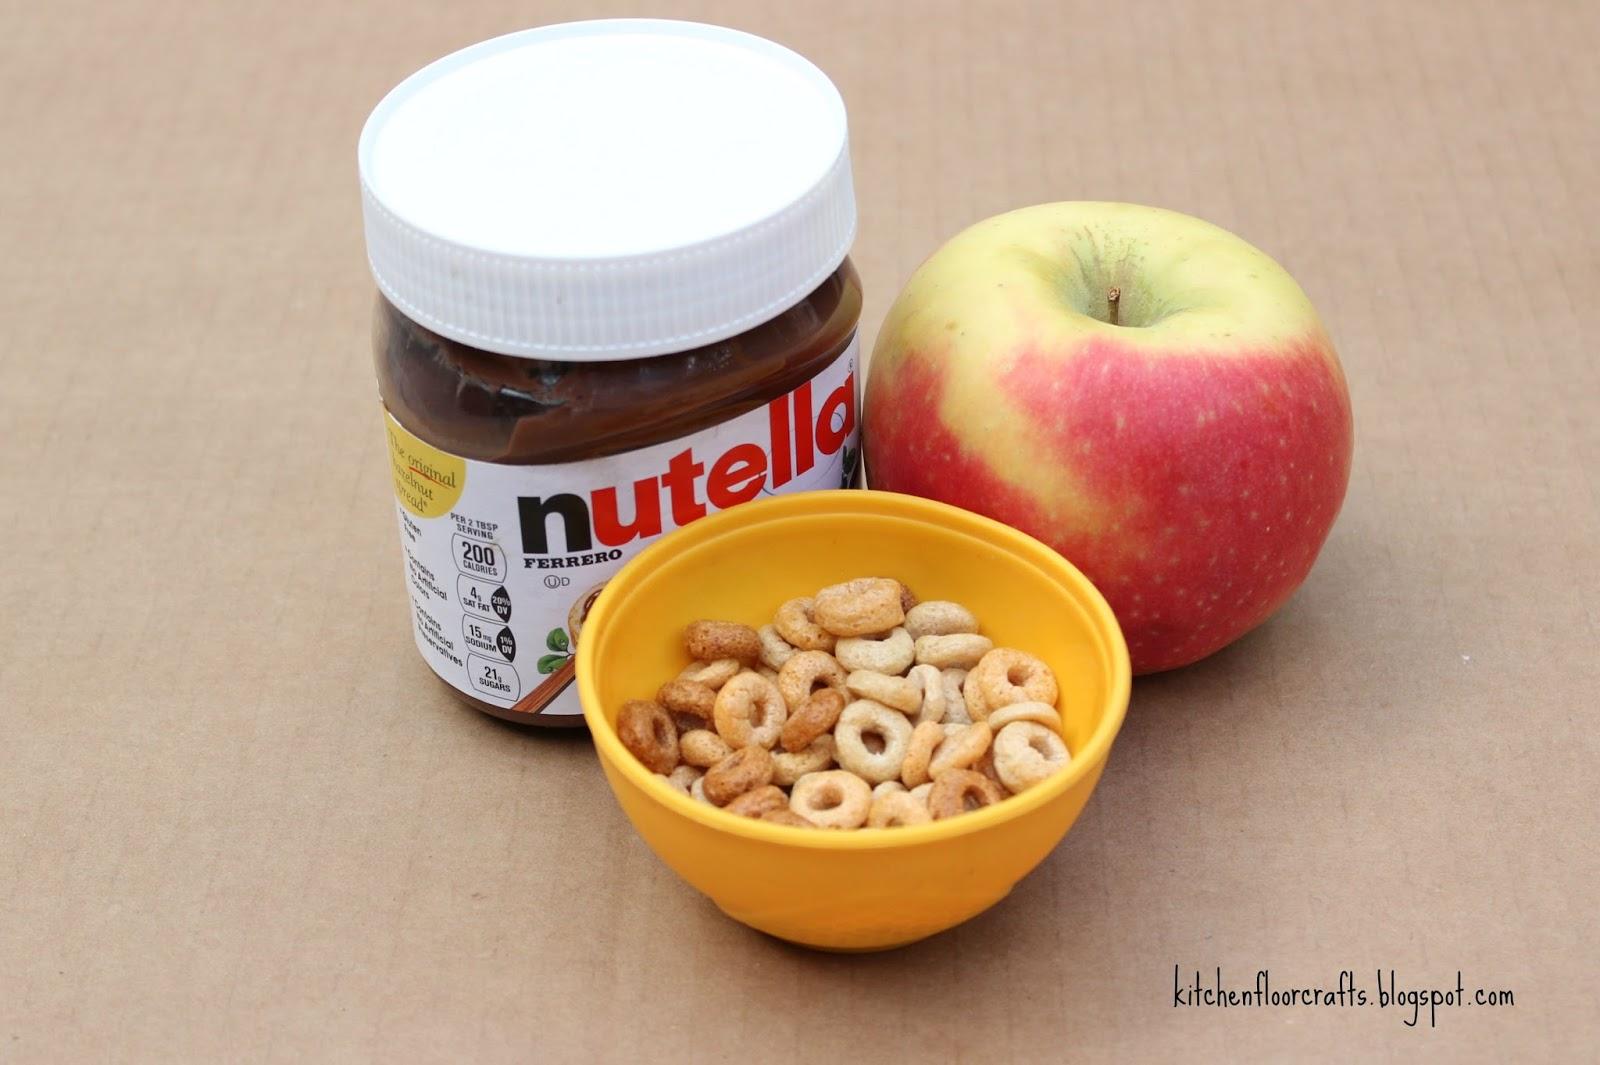 Kitchen Floor Crafts: Apple Nutella Blossom Snack